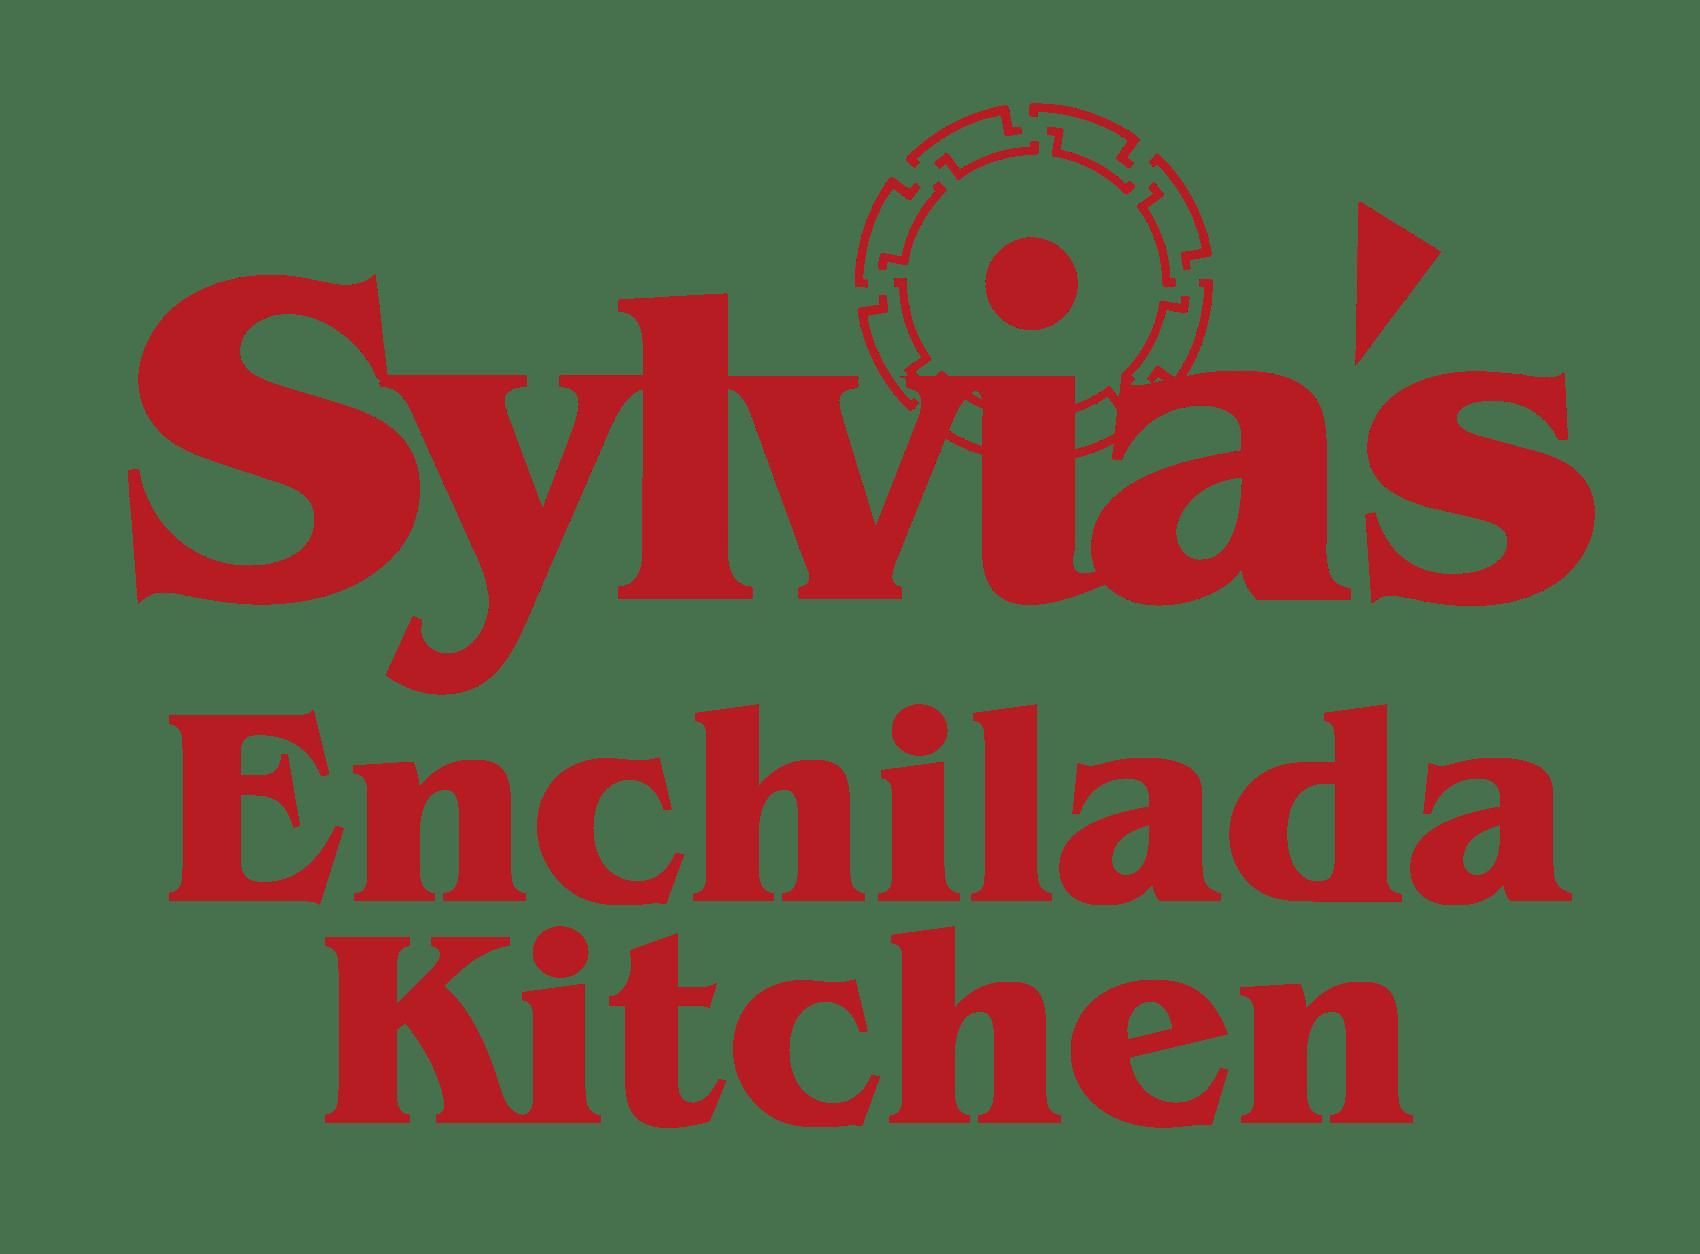 Sylvia's Enchilada Kitchen Home